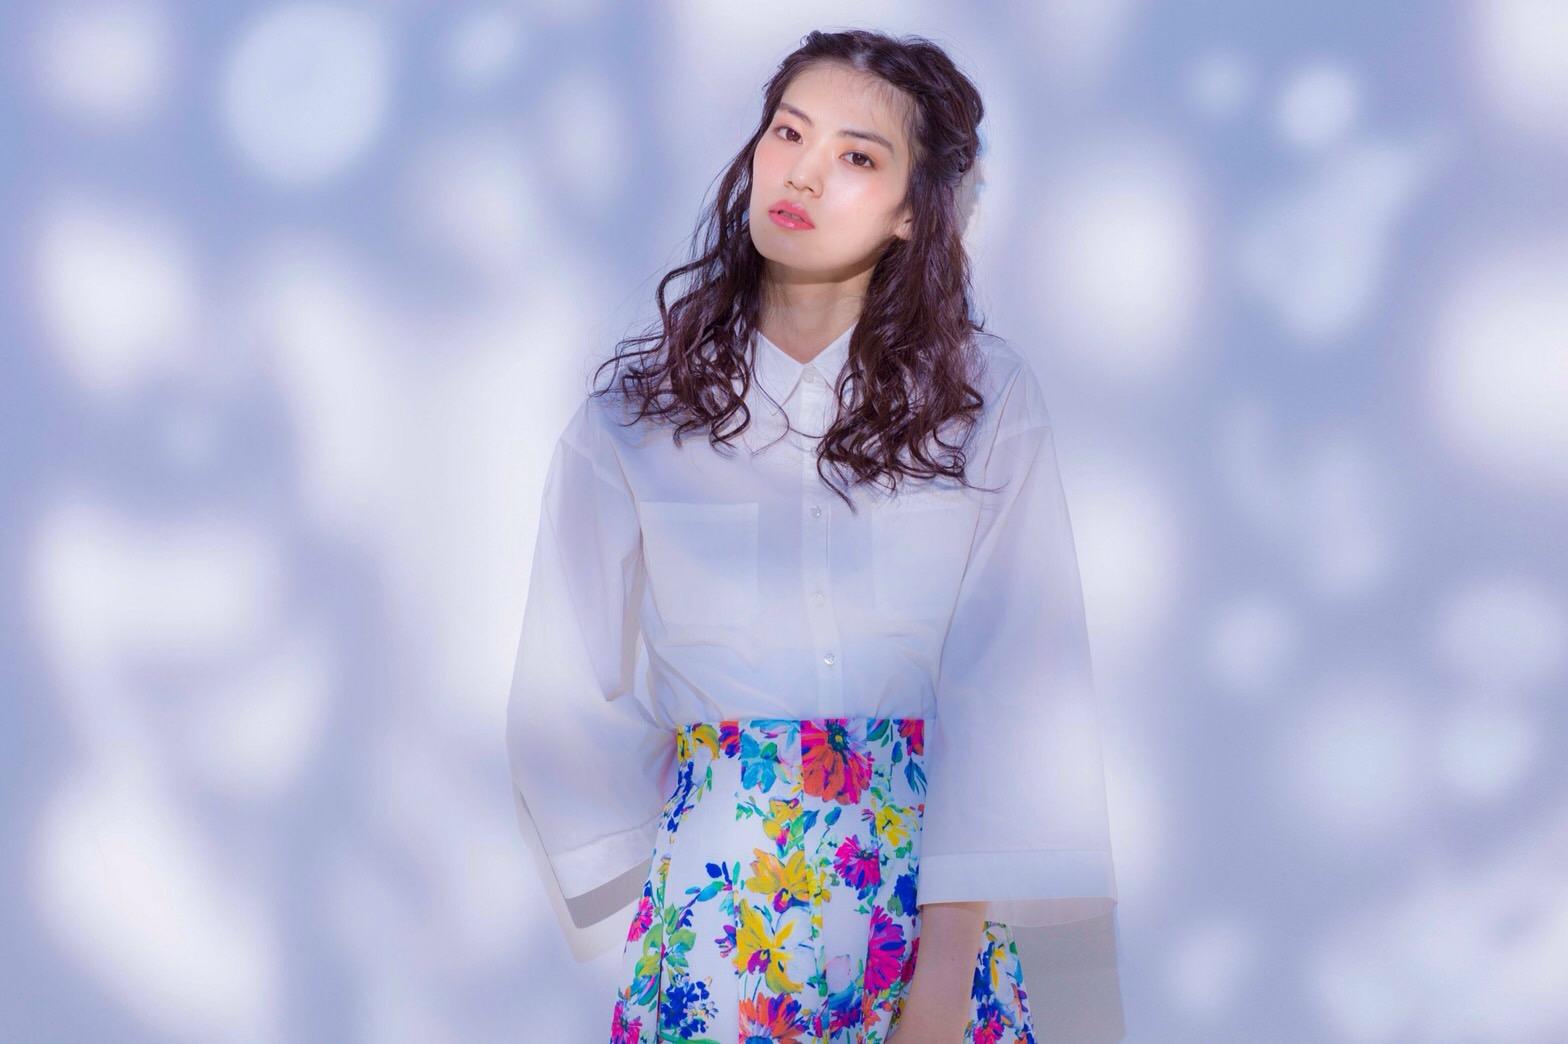 photo gallery: model 江原美希